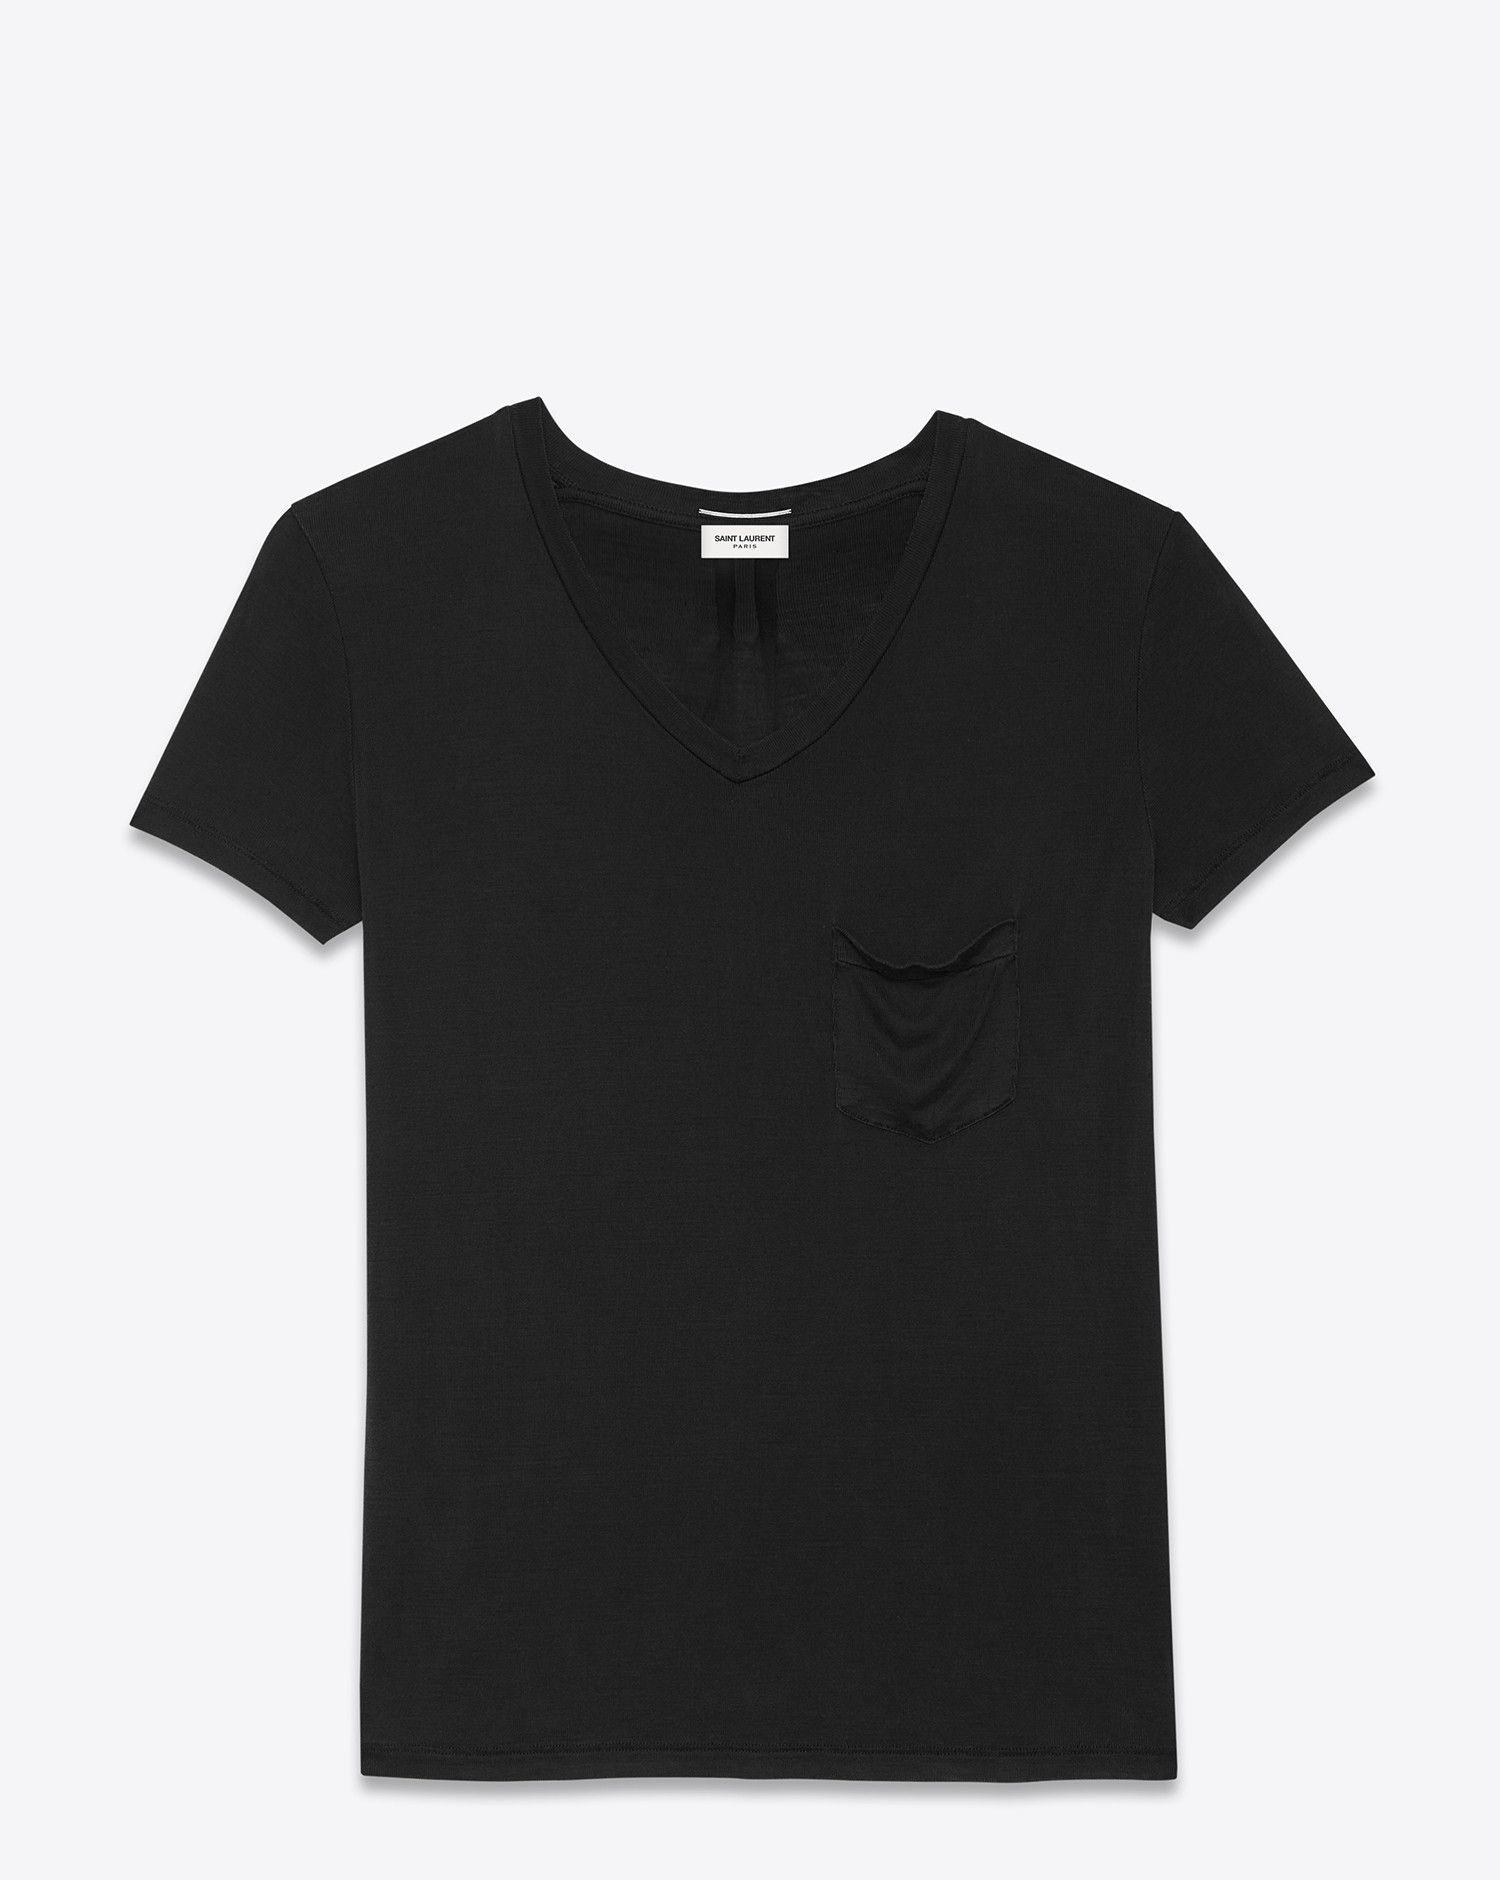 98f8460f24 Saint Laurent classic short sleeve v-neck pocket t shirt in black ...